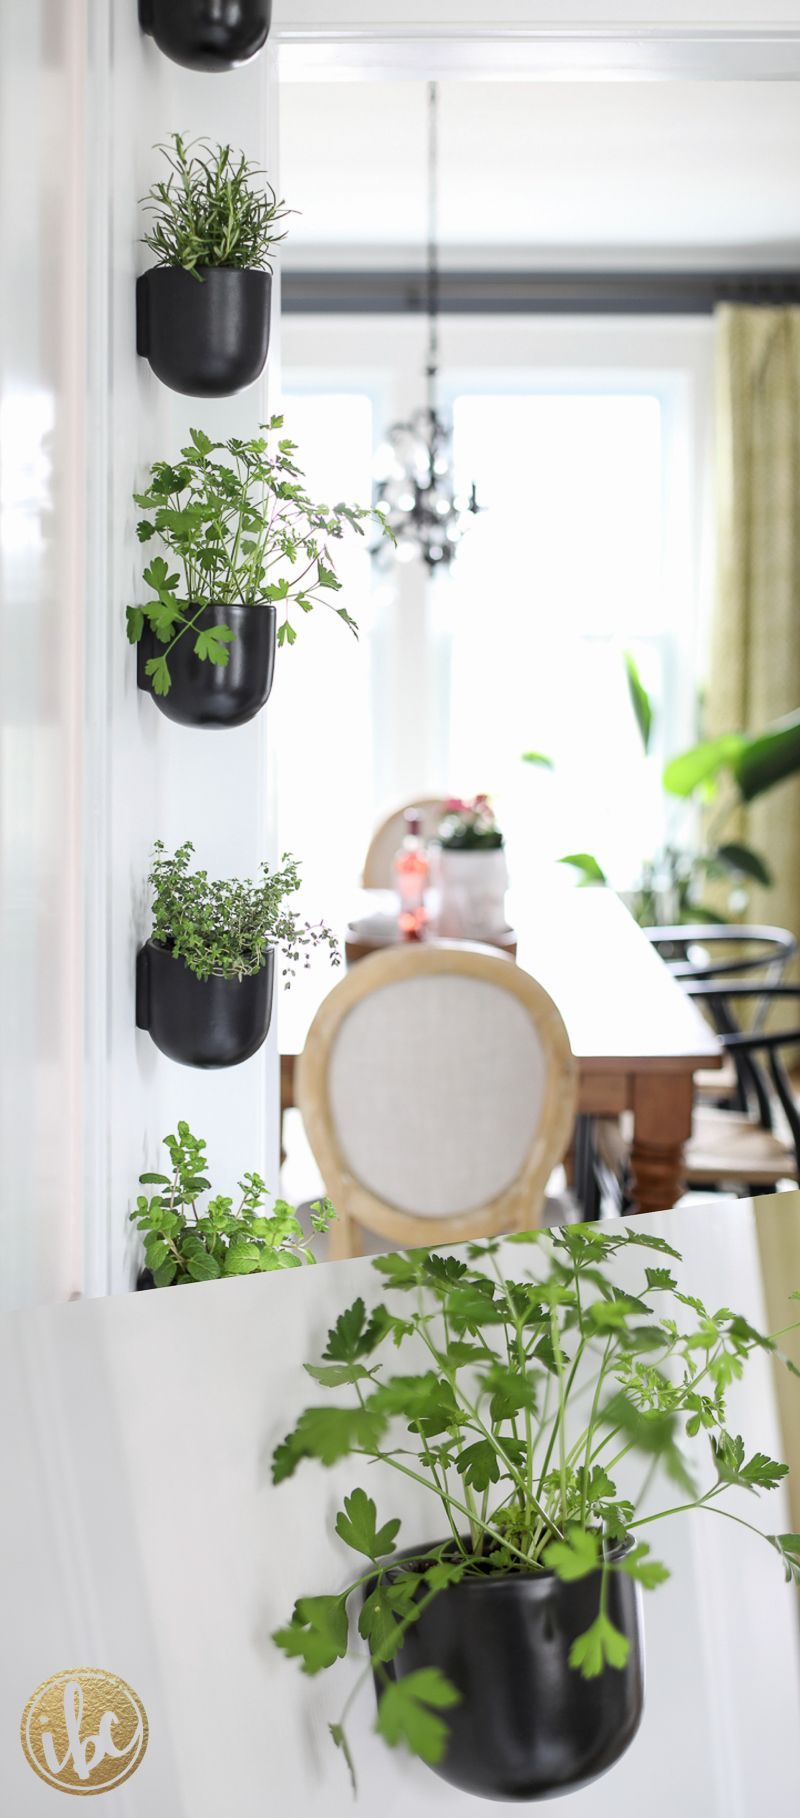 modern hanging kitchen herb garden wall planters diy on indoor herb garden diy wall vertical planter id=35315